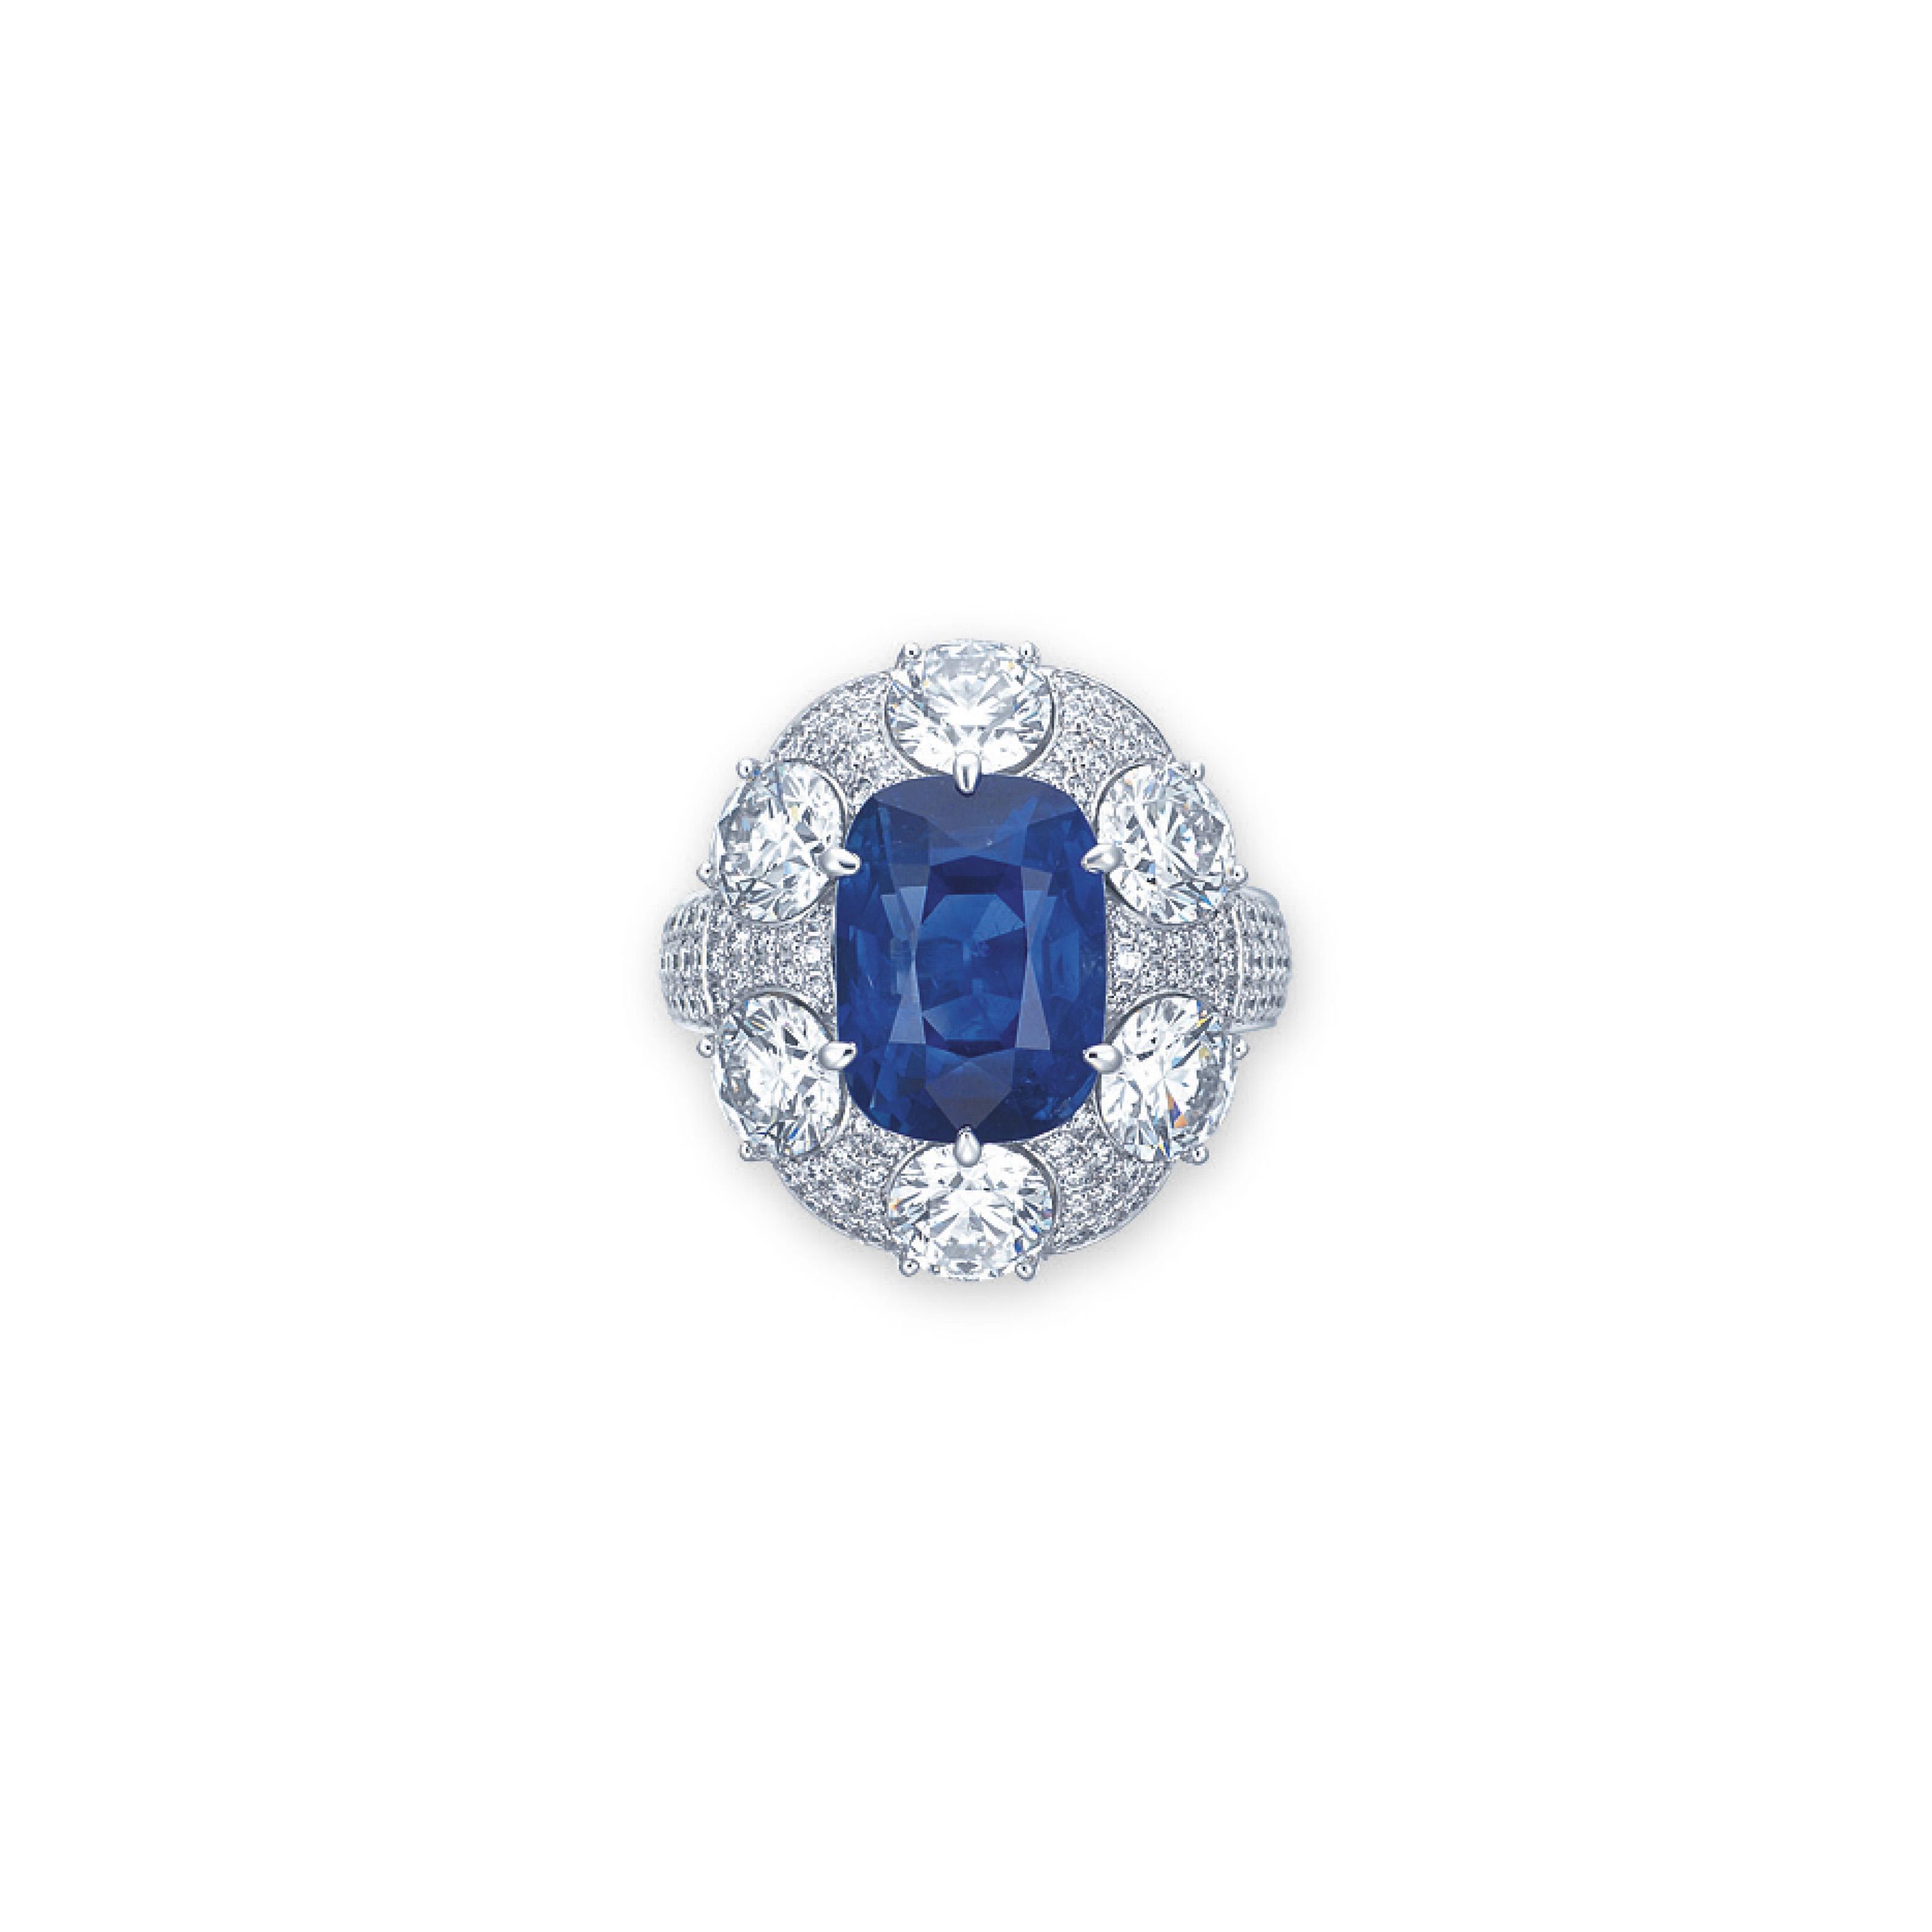 A RARE SAPPHIRE AND DIAMOND RING, BY GÜBELIN